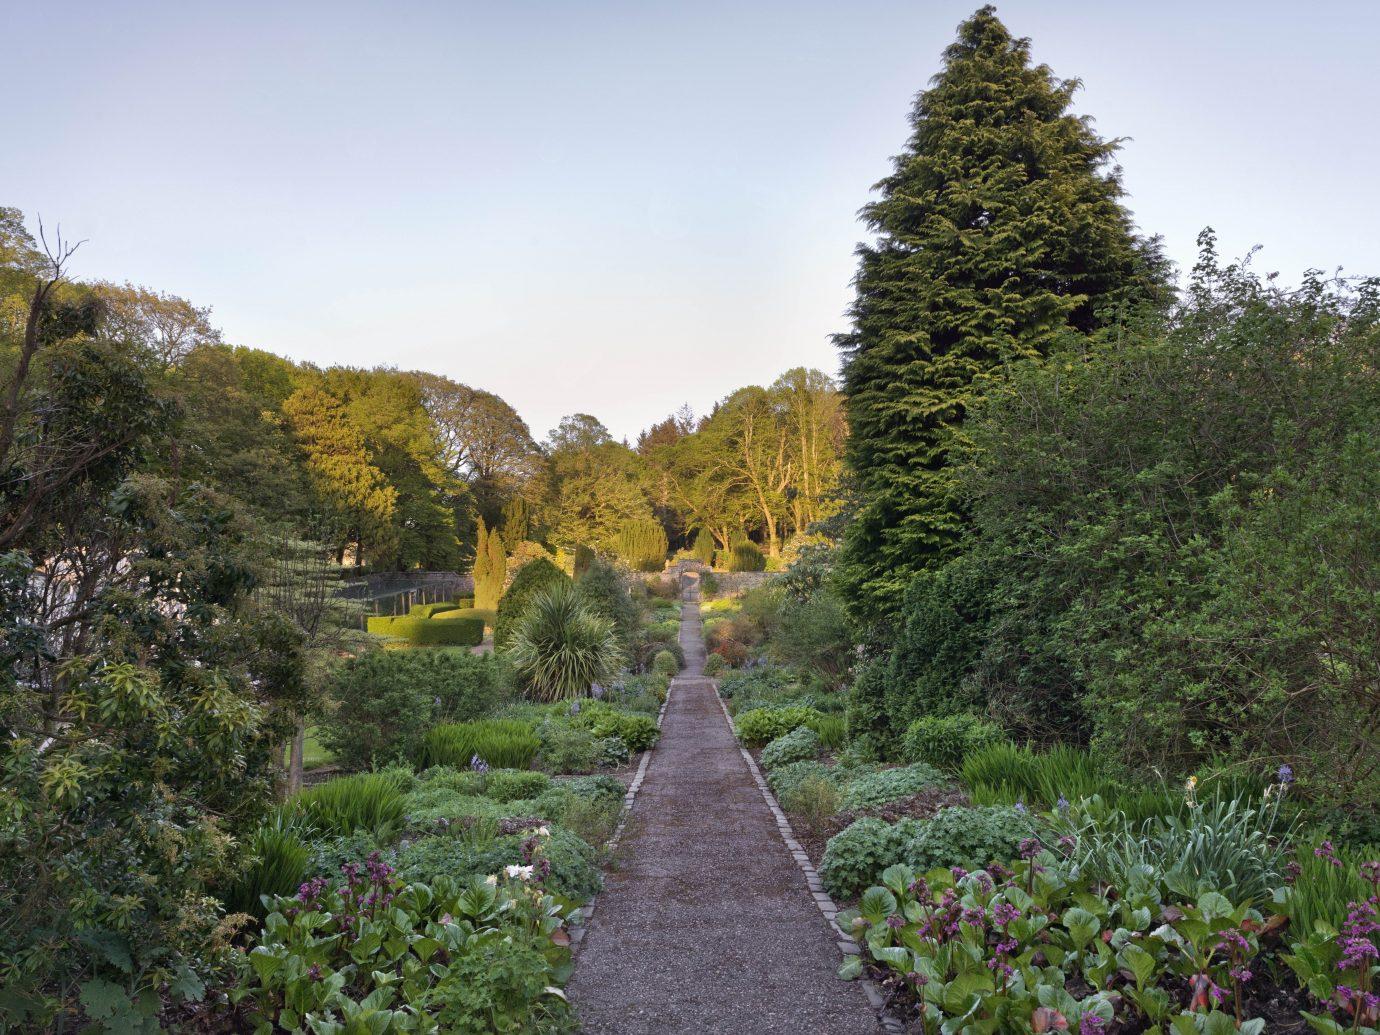 The Walled Garden at Glenapp Castle